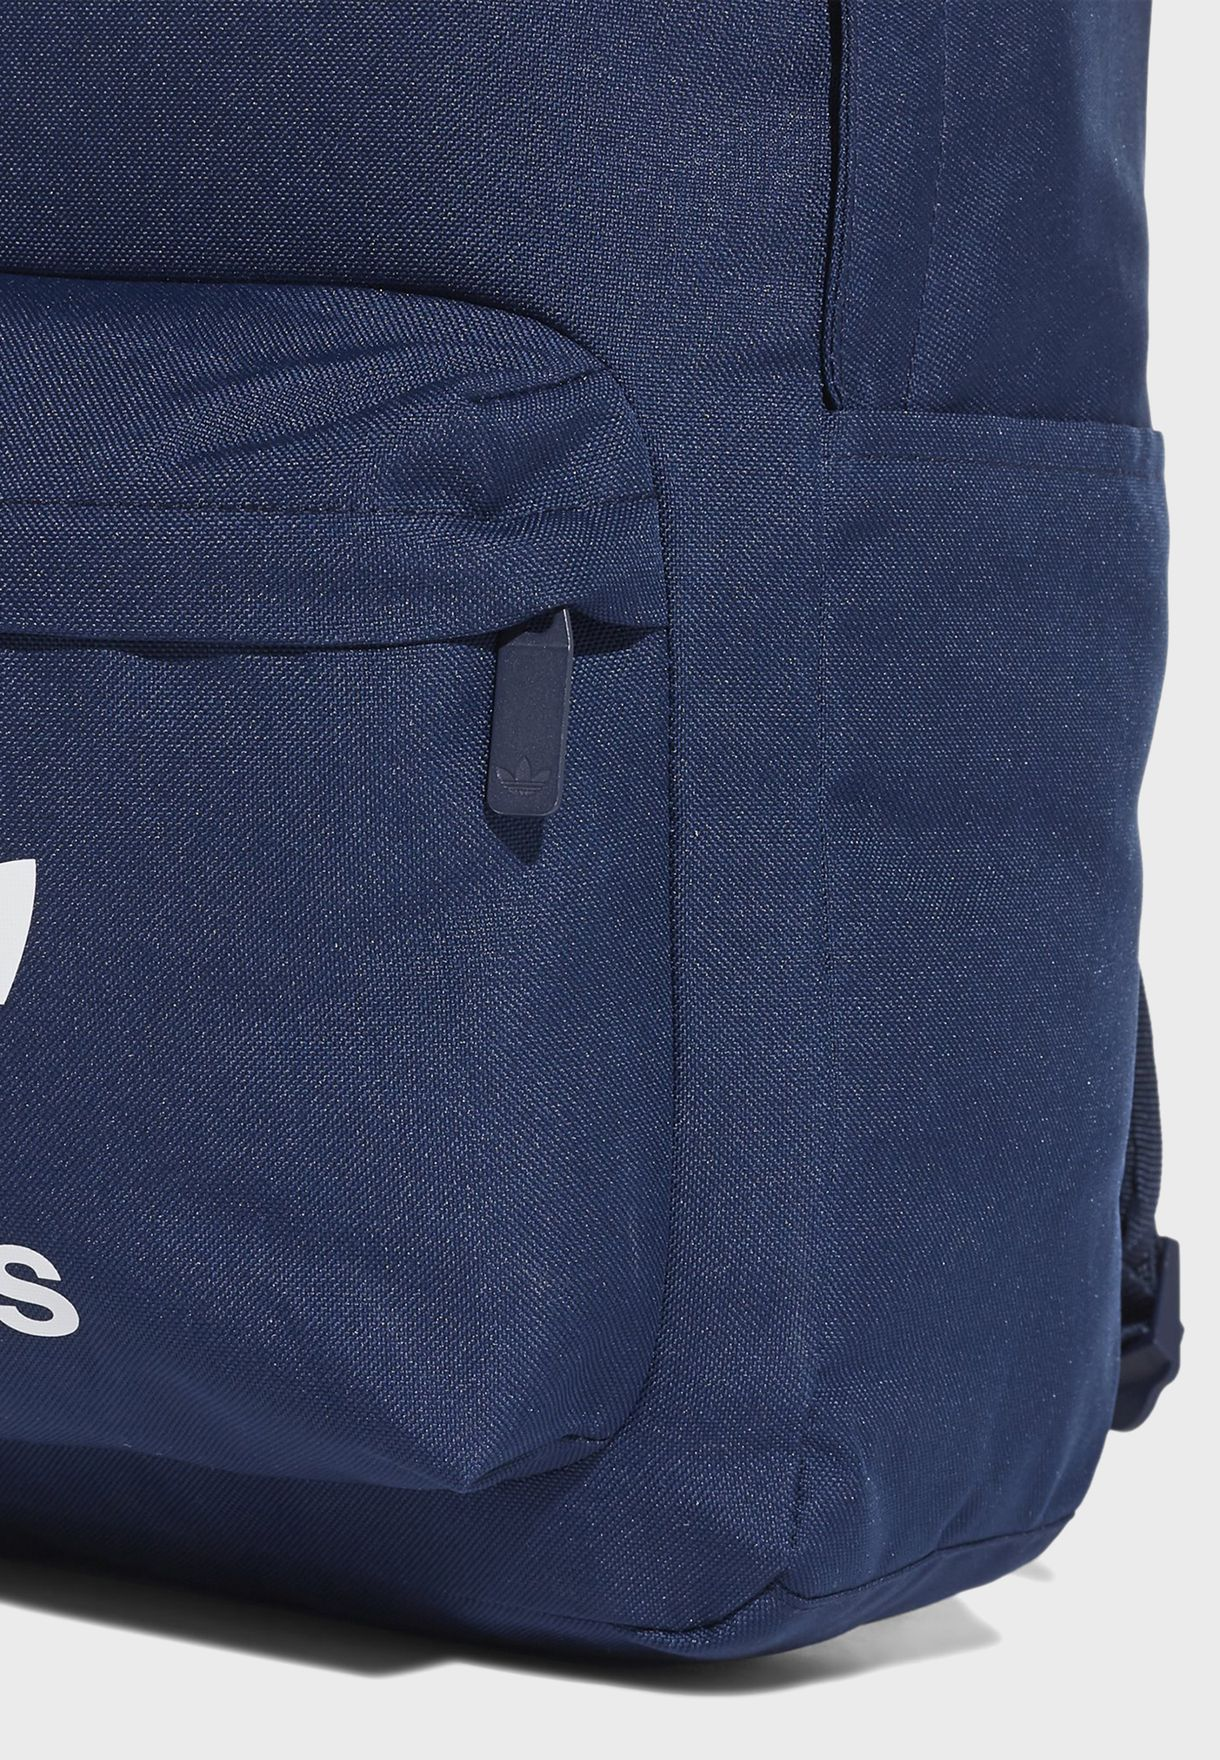 Classic Adicolor Casual Unisex Backpack